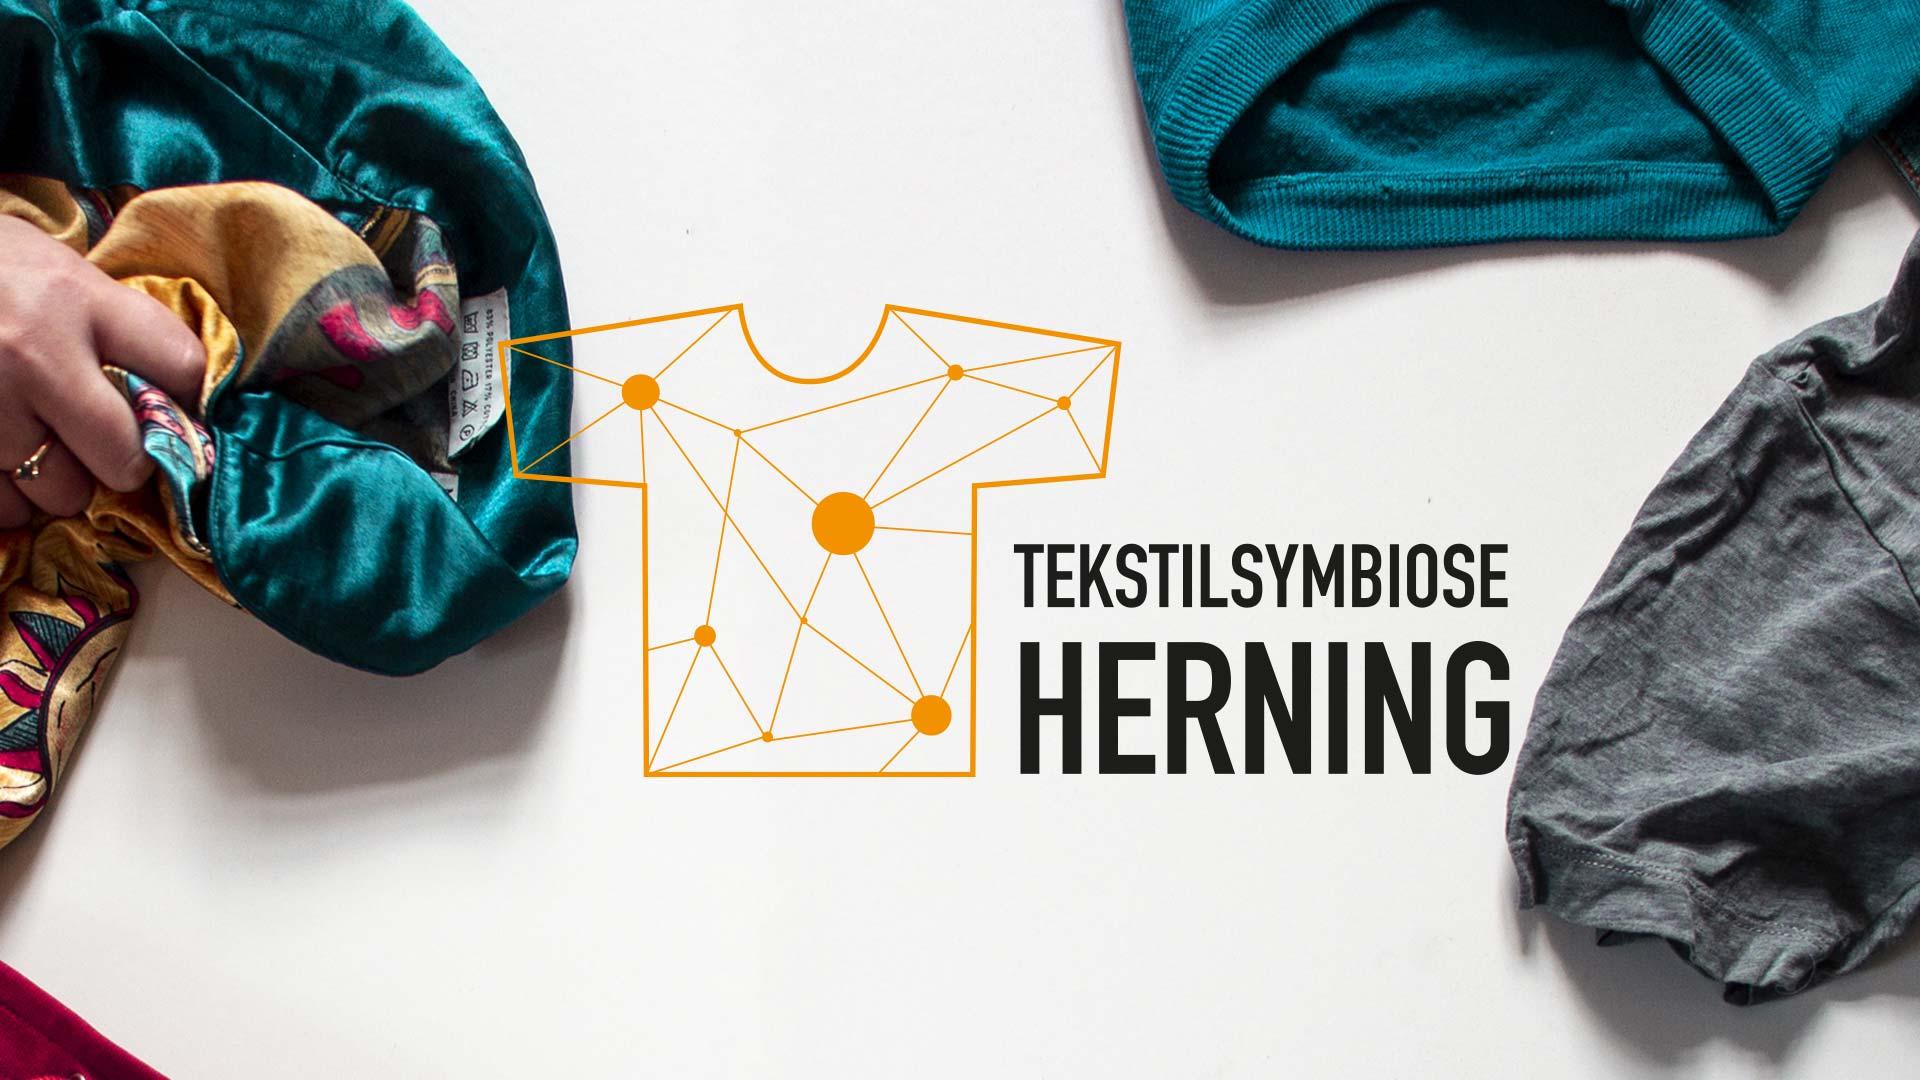 Tekstilsymbiose Herning